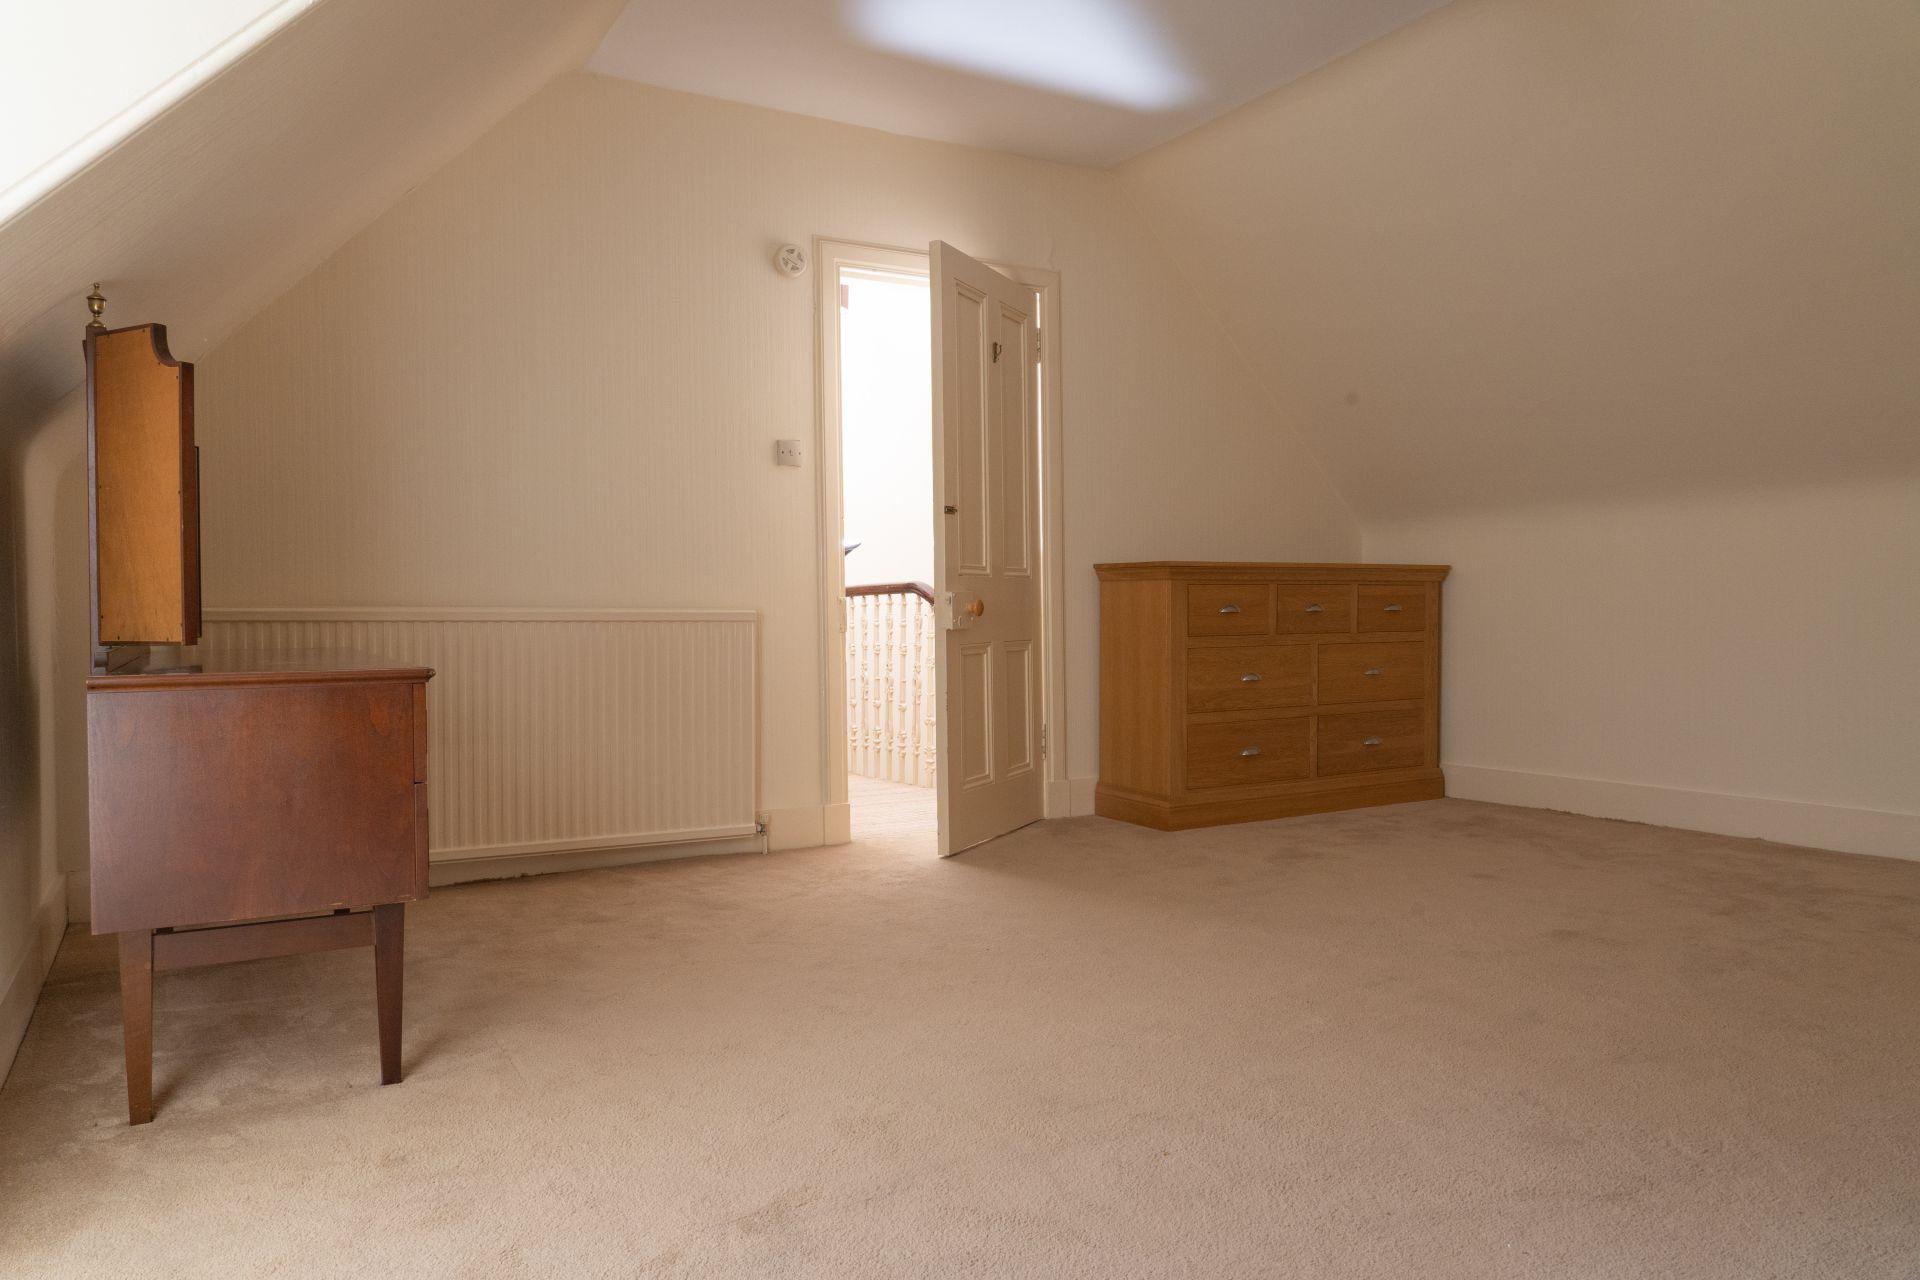 ARD-Properties-Development-Sites-Buy-Homes-Rent-Aberdeenshire-Rentals-2a-St-Andrew-Streeet-Peterhead-Banner (18)